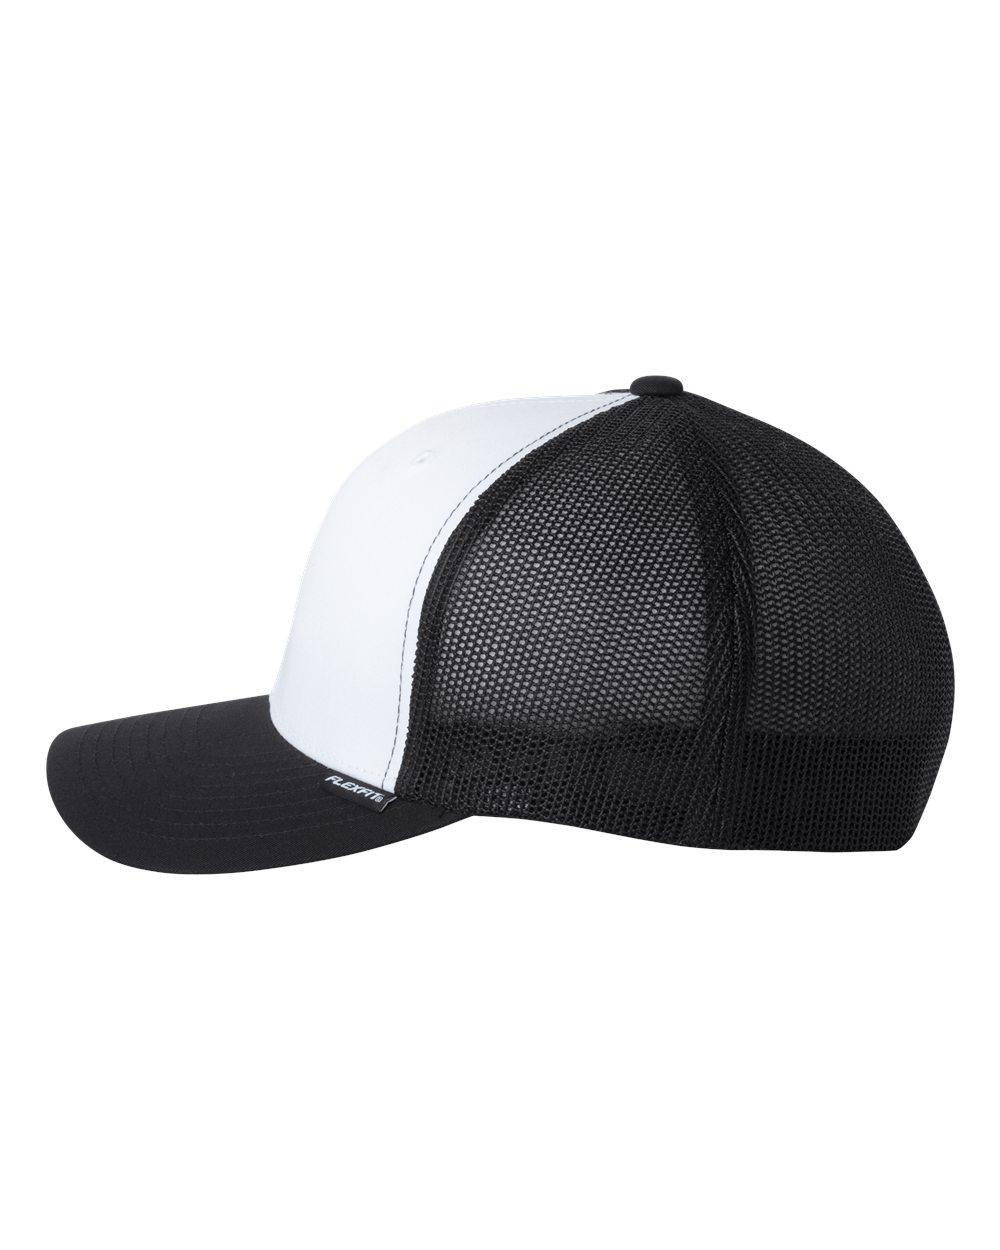 click to view Black/White/Black